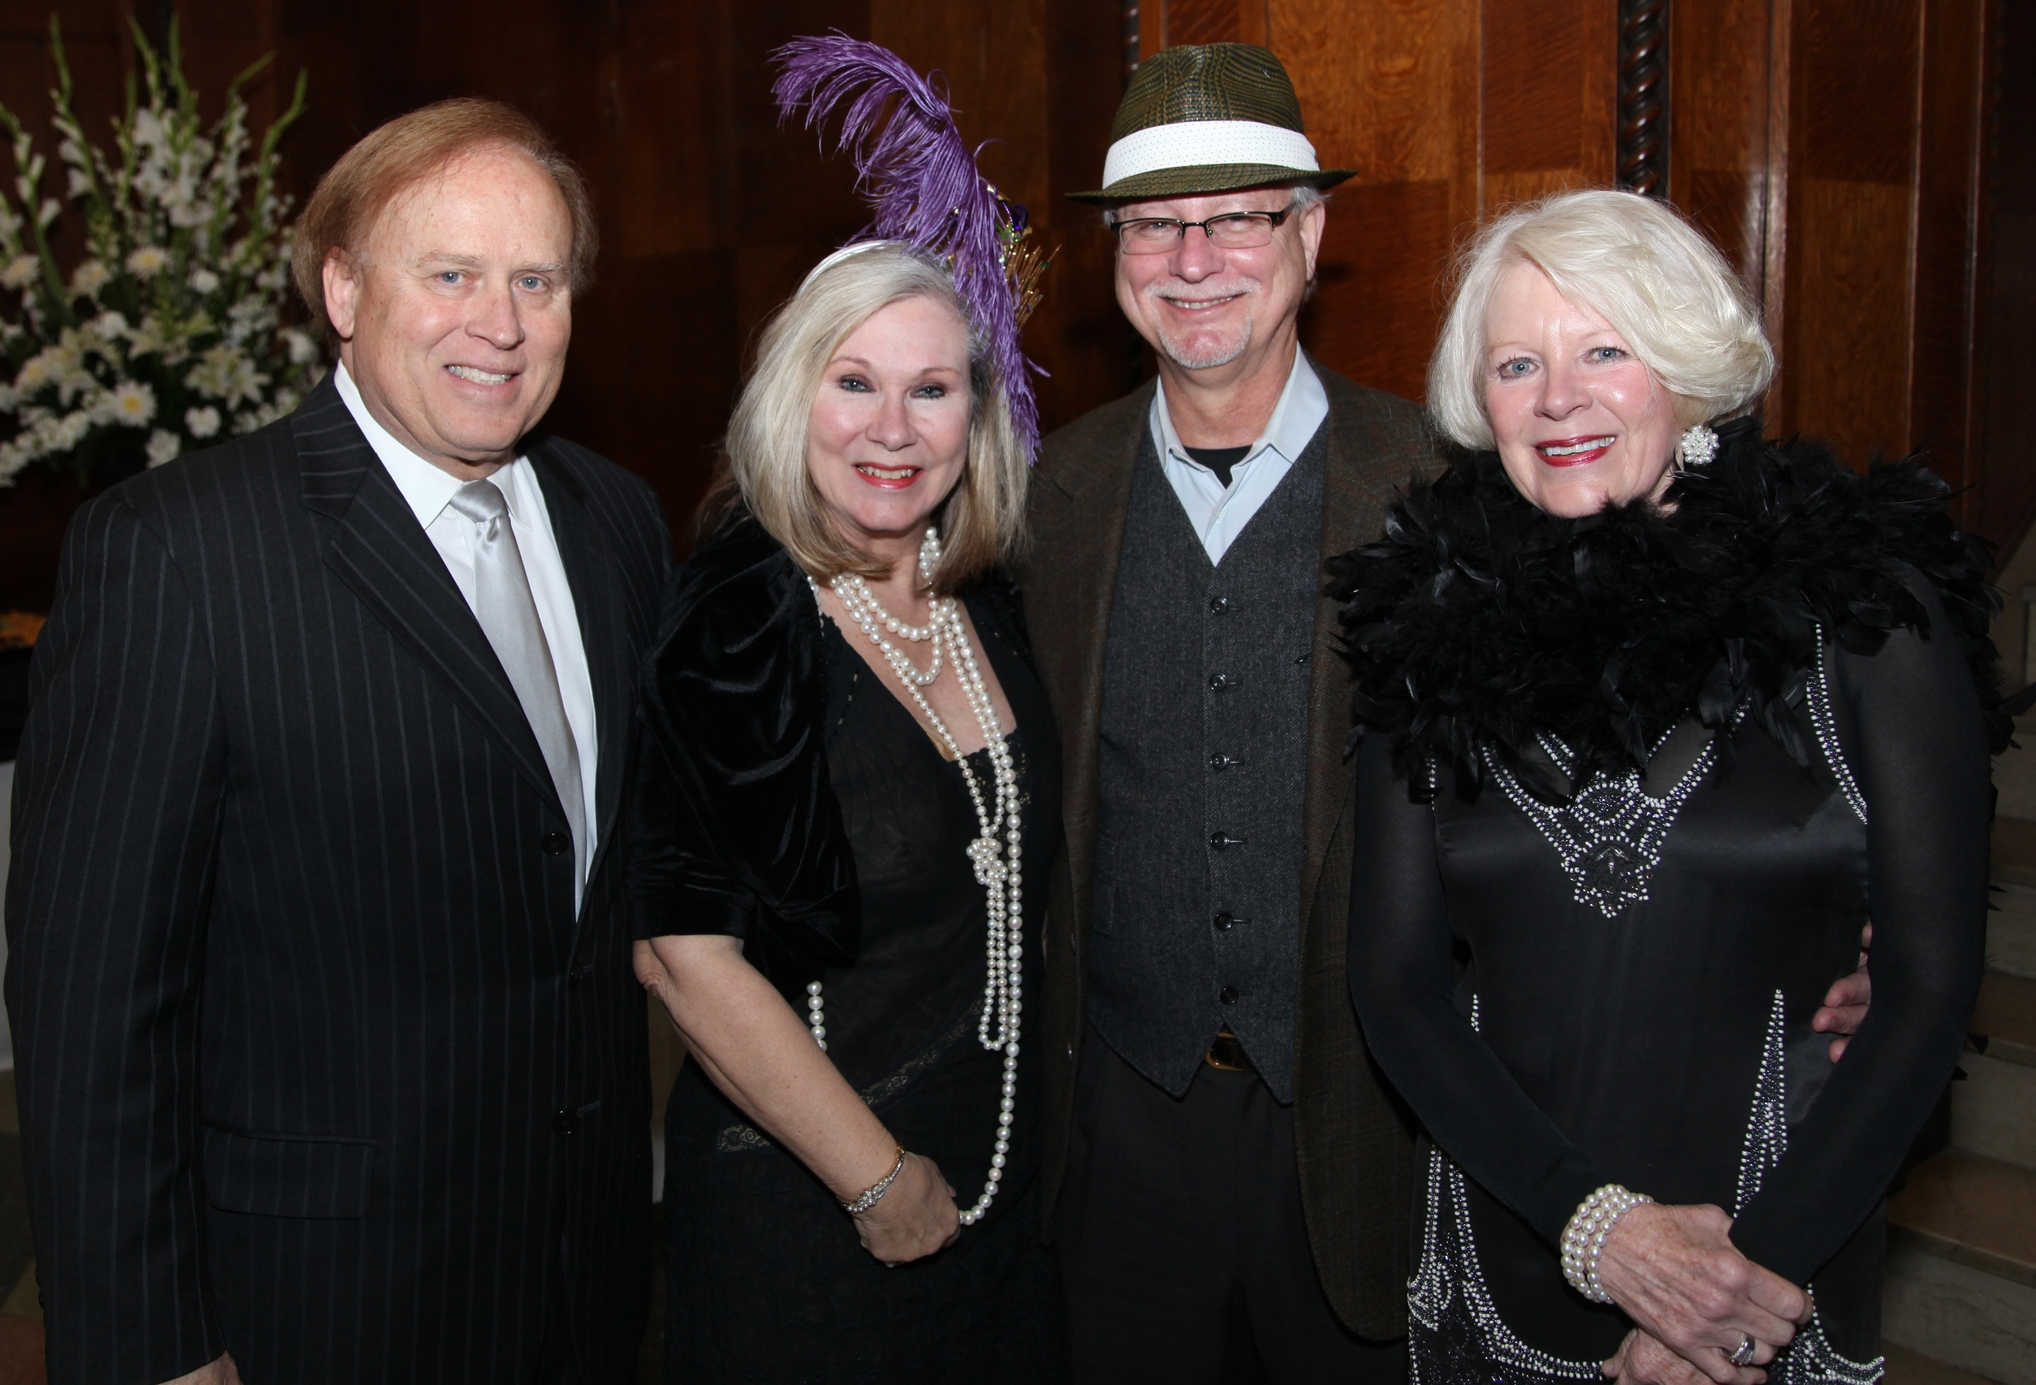 Jay & Kathy Louviere, Bill & Nelda Cox